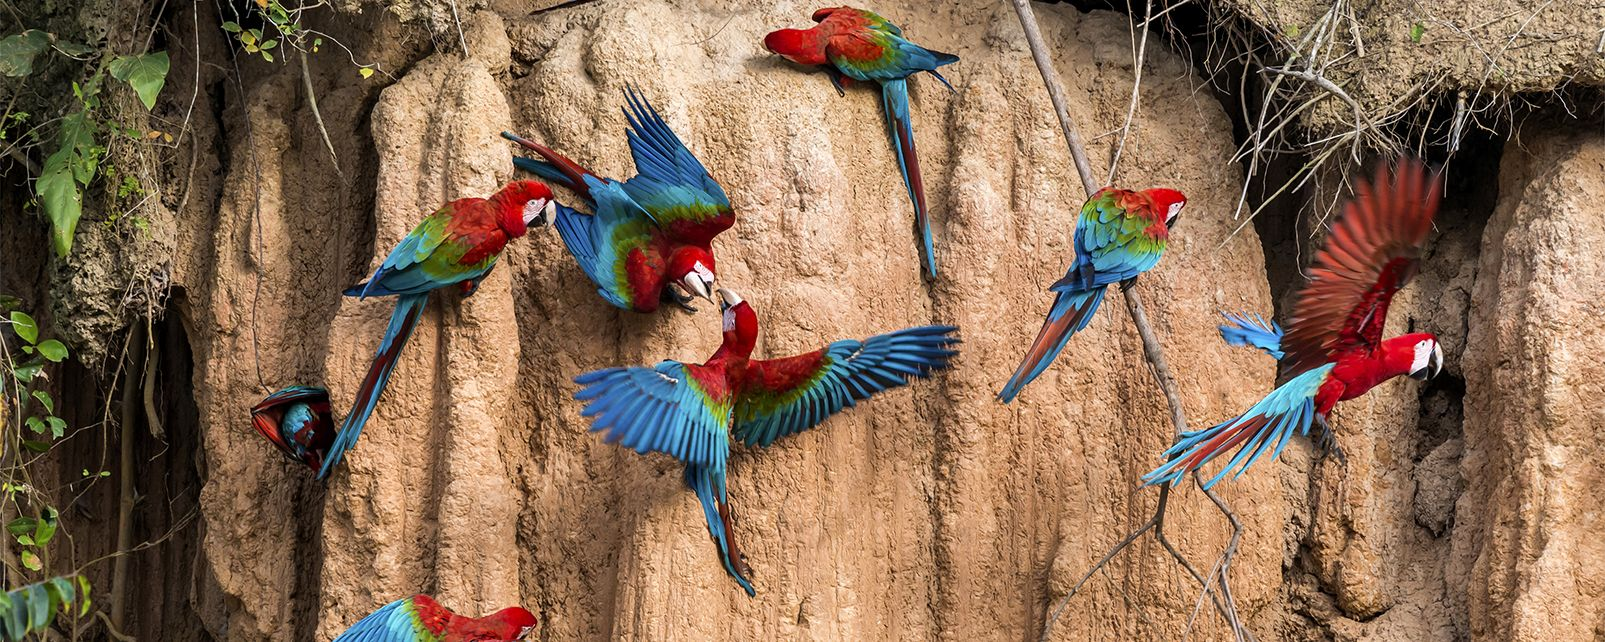 La selvaggia Amazzonia  Brasile